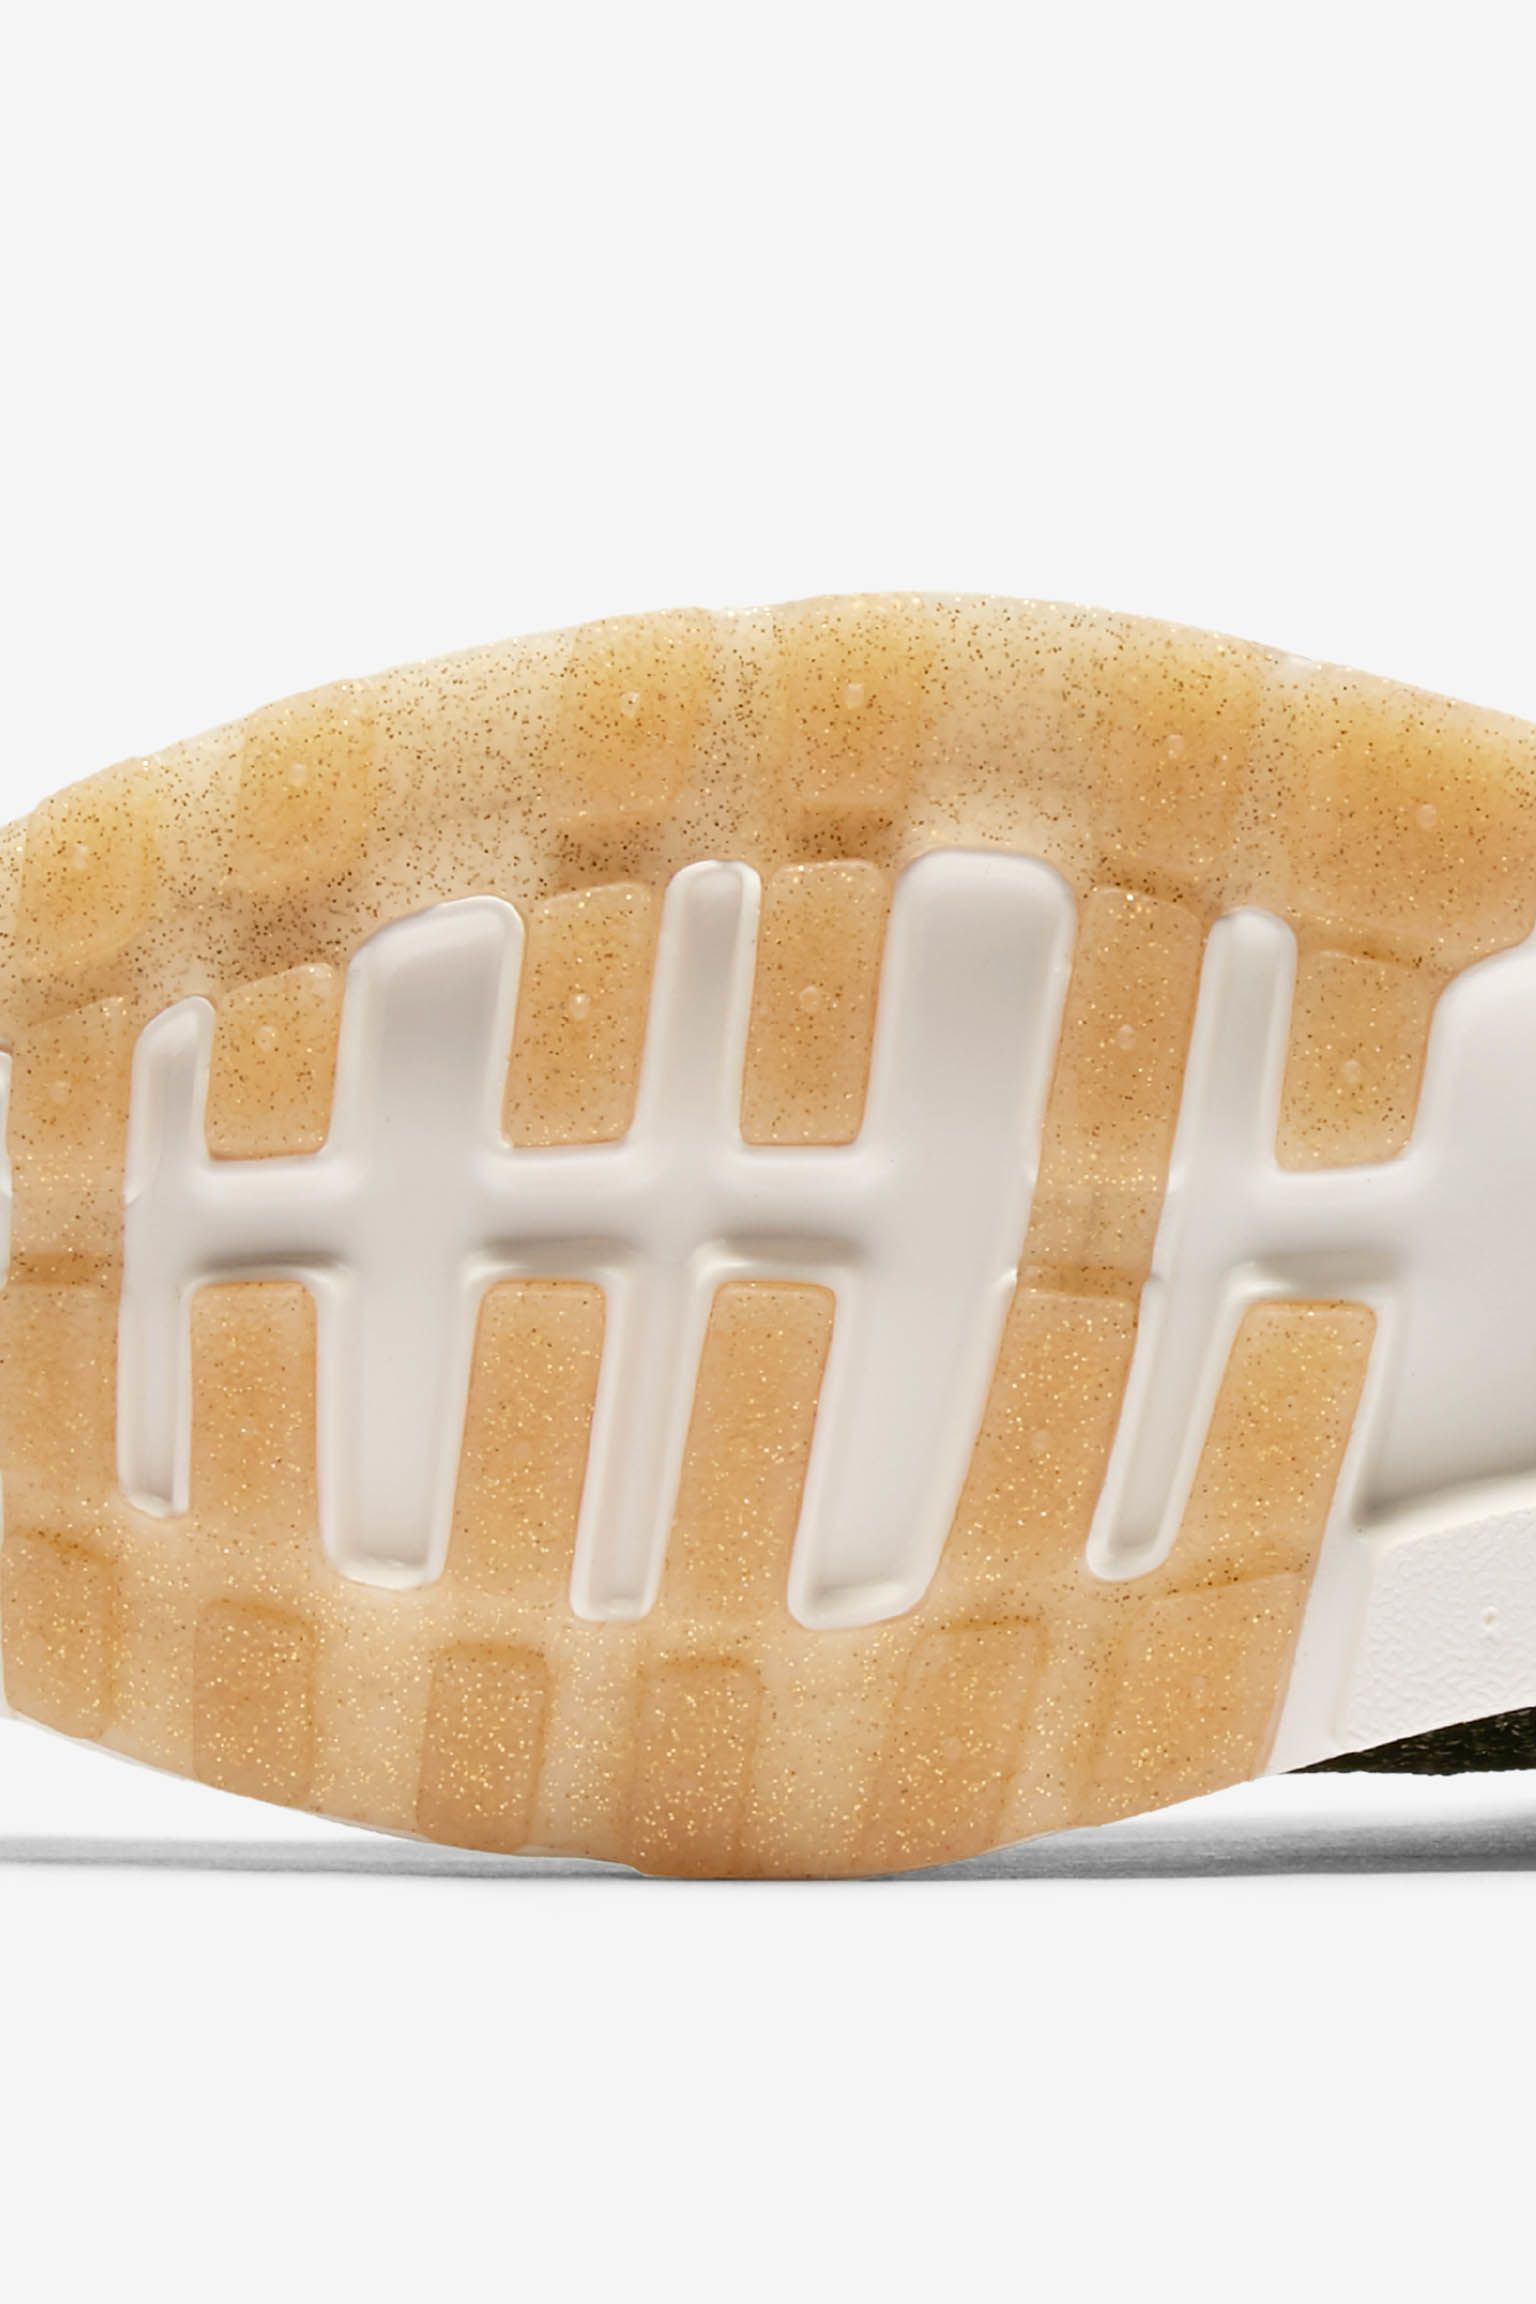 "Buty damskie Nike Air Max 1 Ultra 2.0 Flyknit Metallic ""Black & Metallic Gold"""